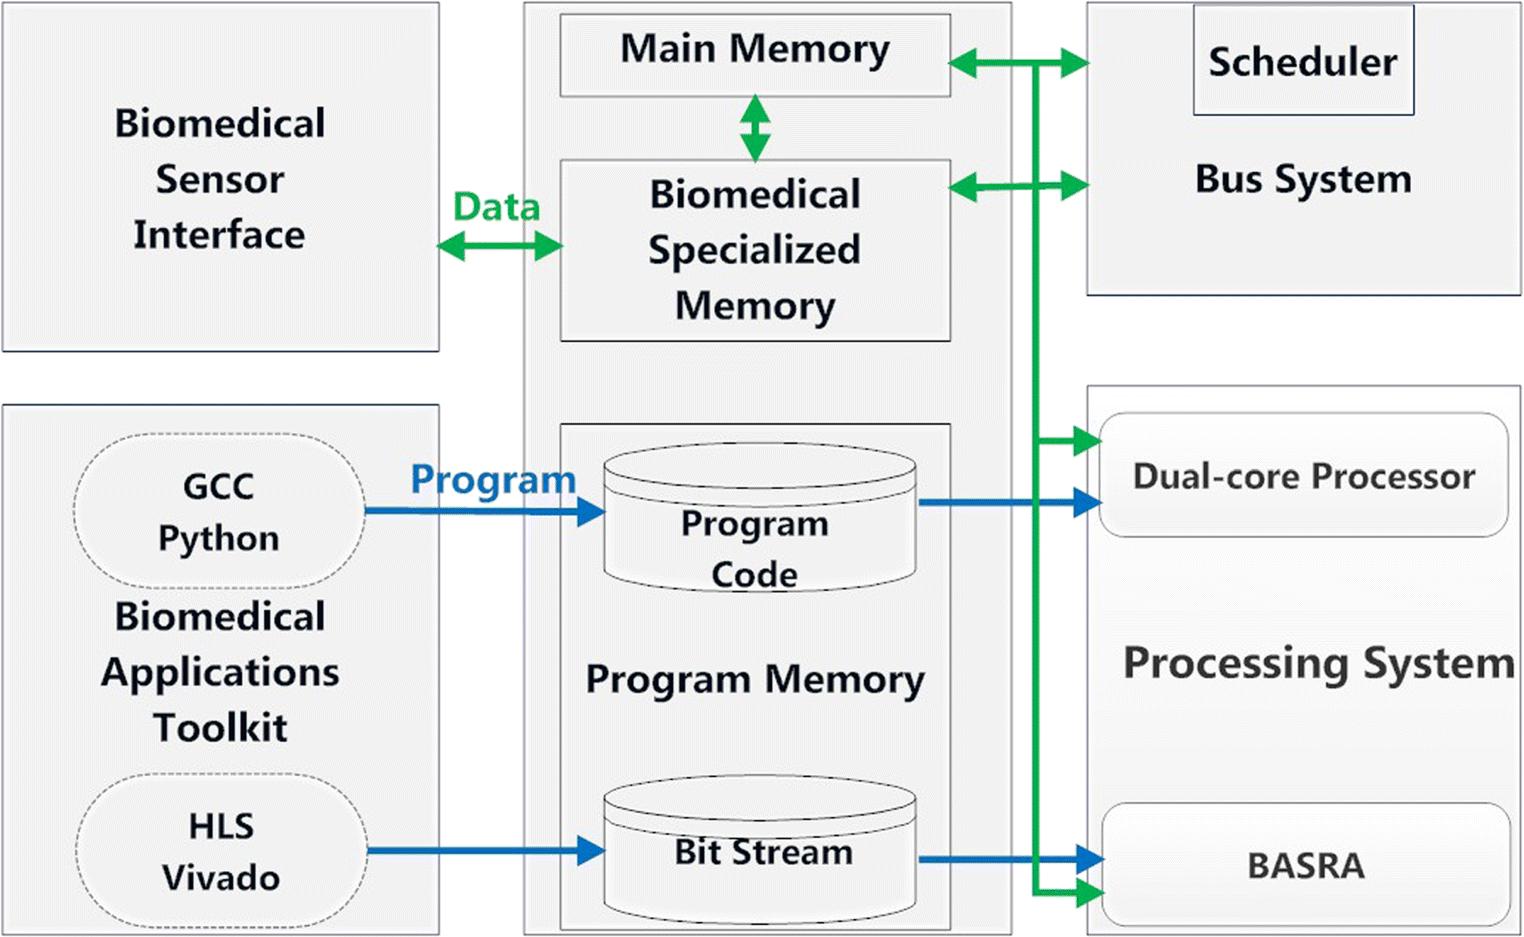 A Heterogeneous Multi-Core Based Biomedical Application